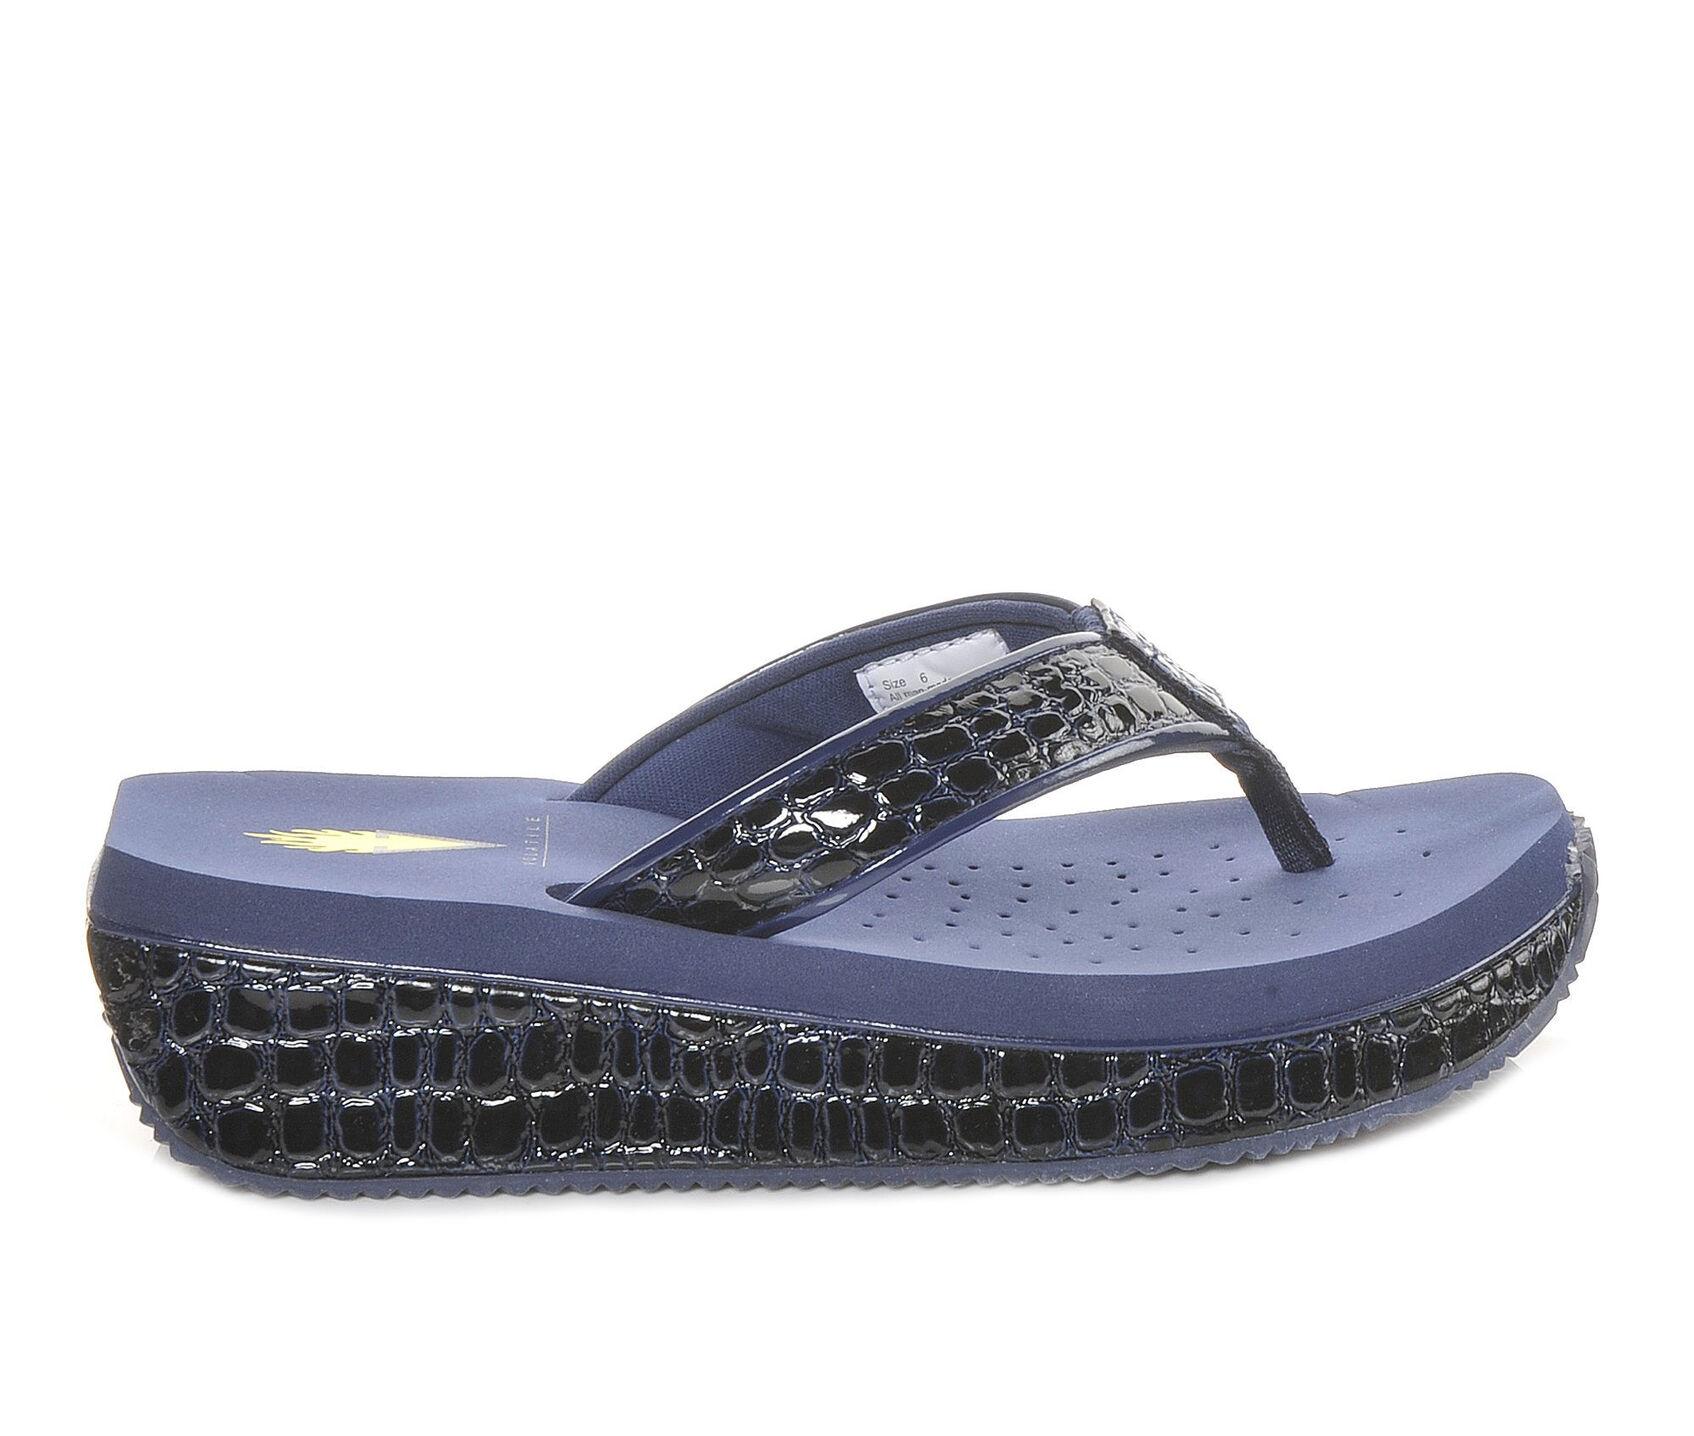 b5d02296b9 Women's Volatile Mini Croco Platform Flip-Flops   Shoe Carnival